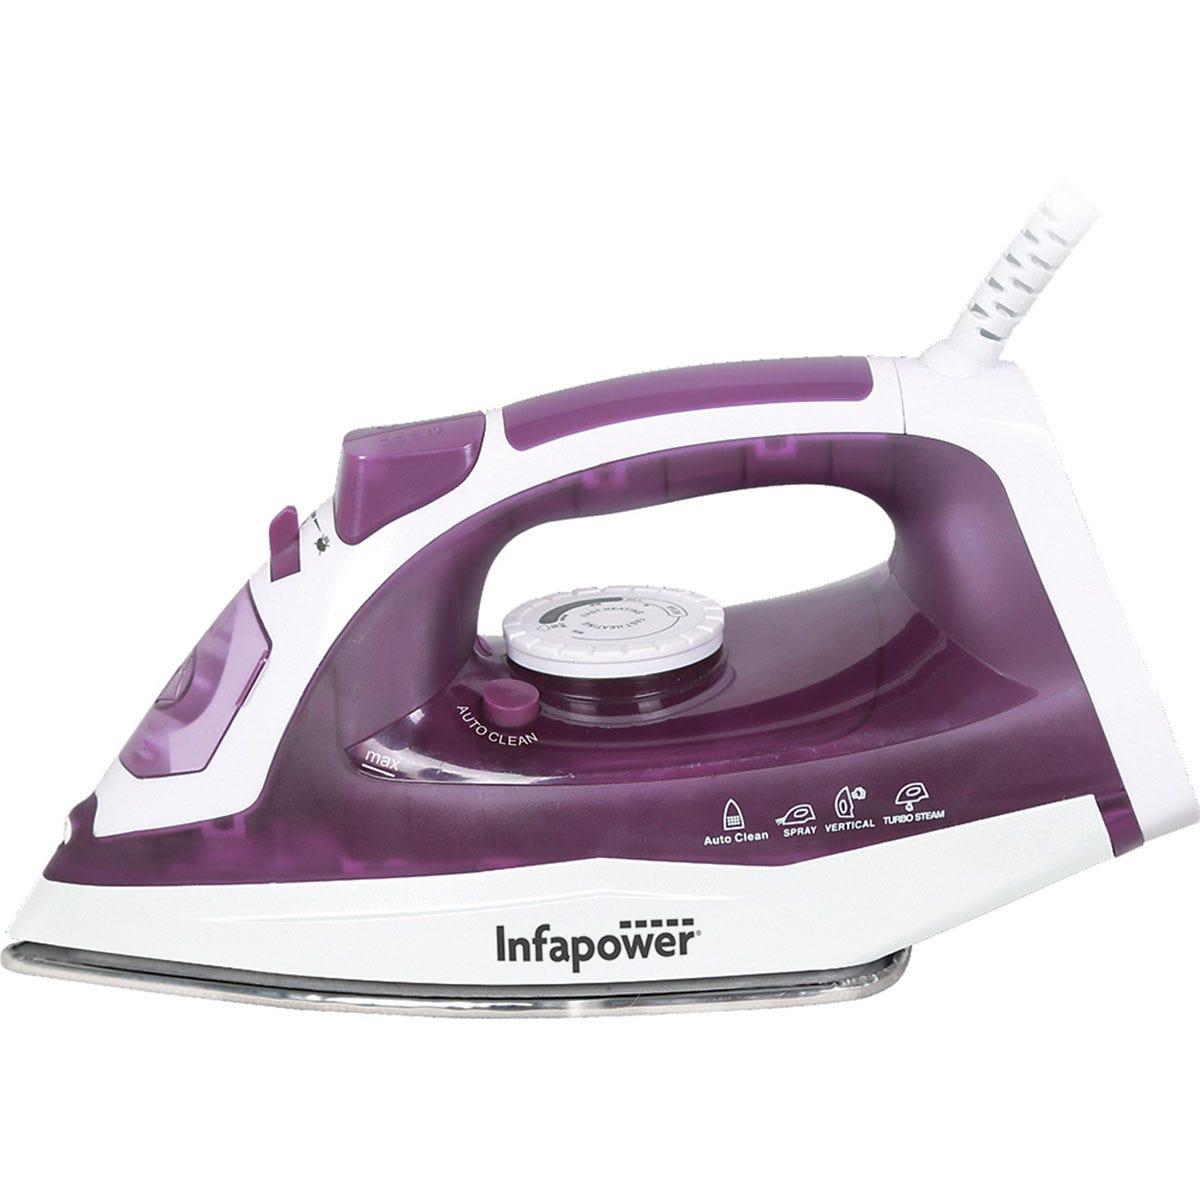 Infapower X603 2400W Steam Iron - White and Purple